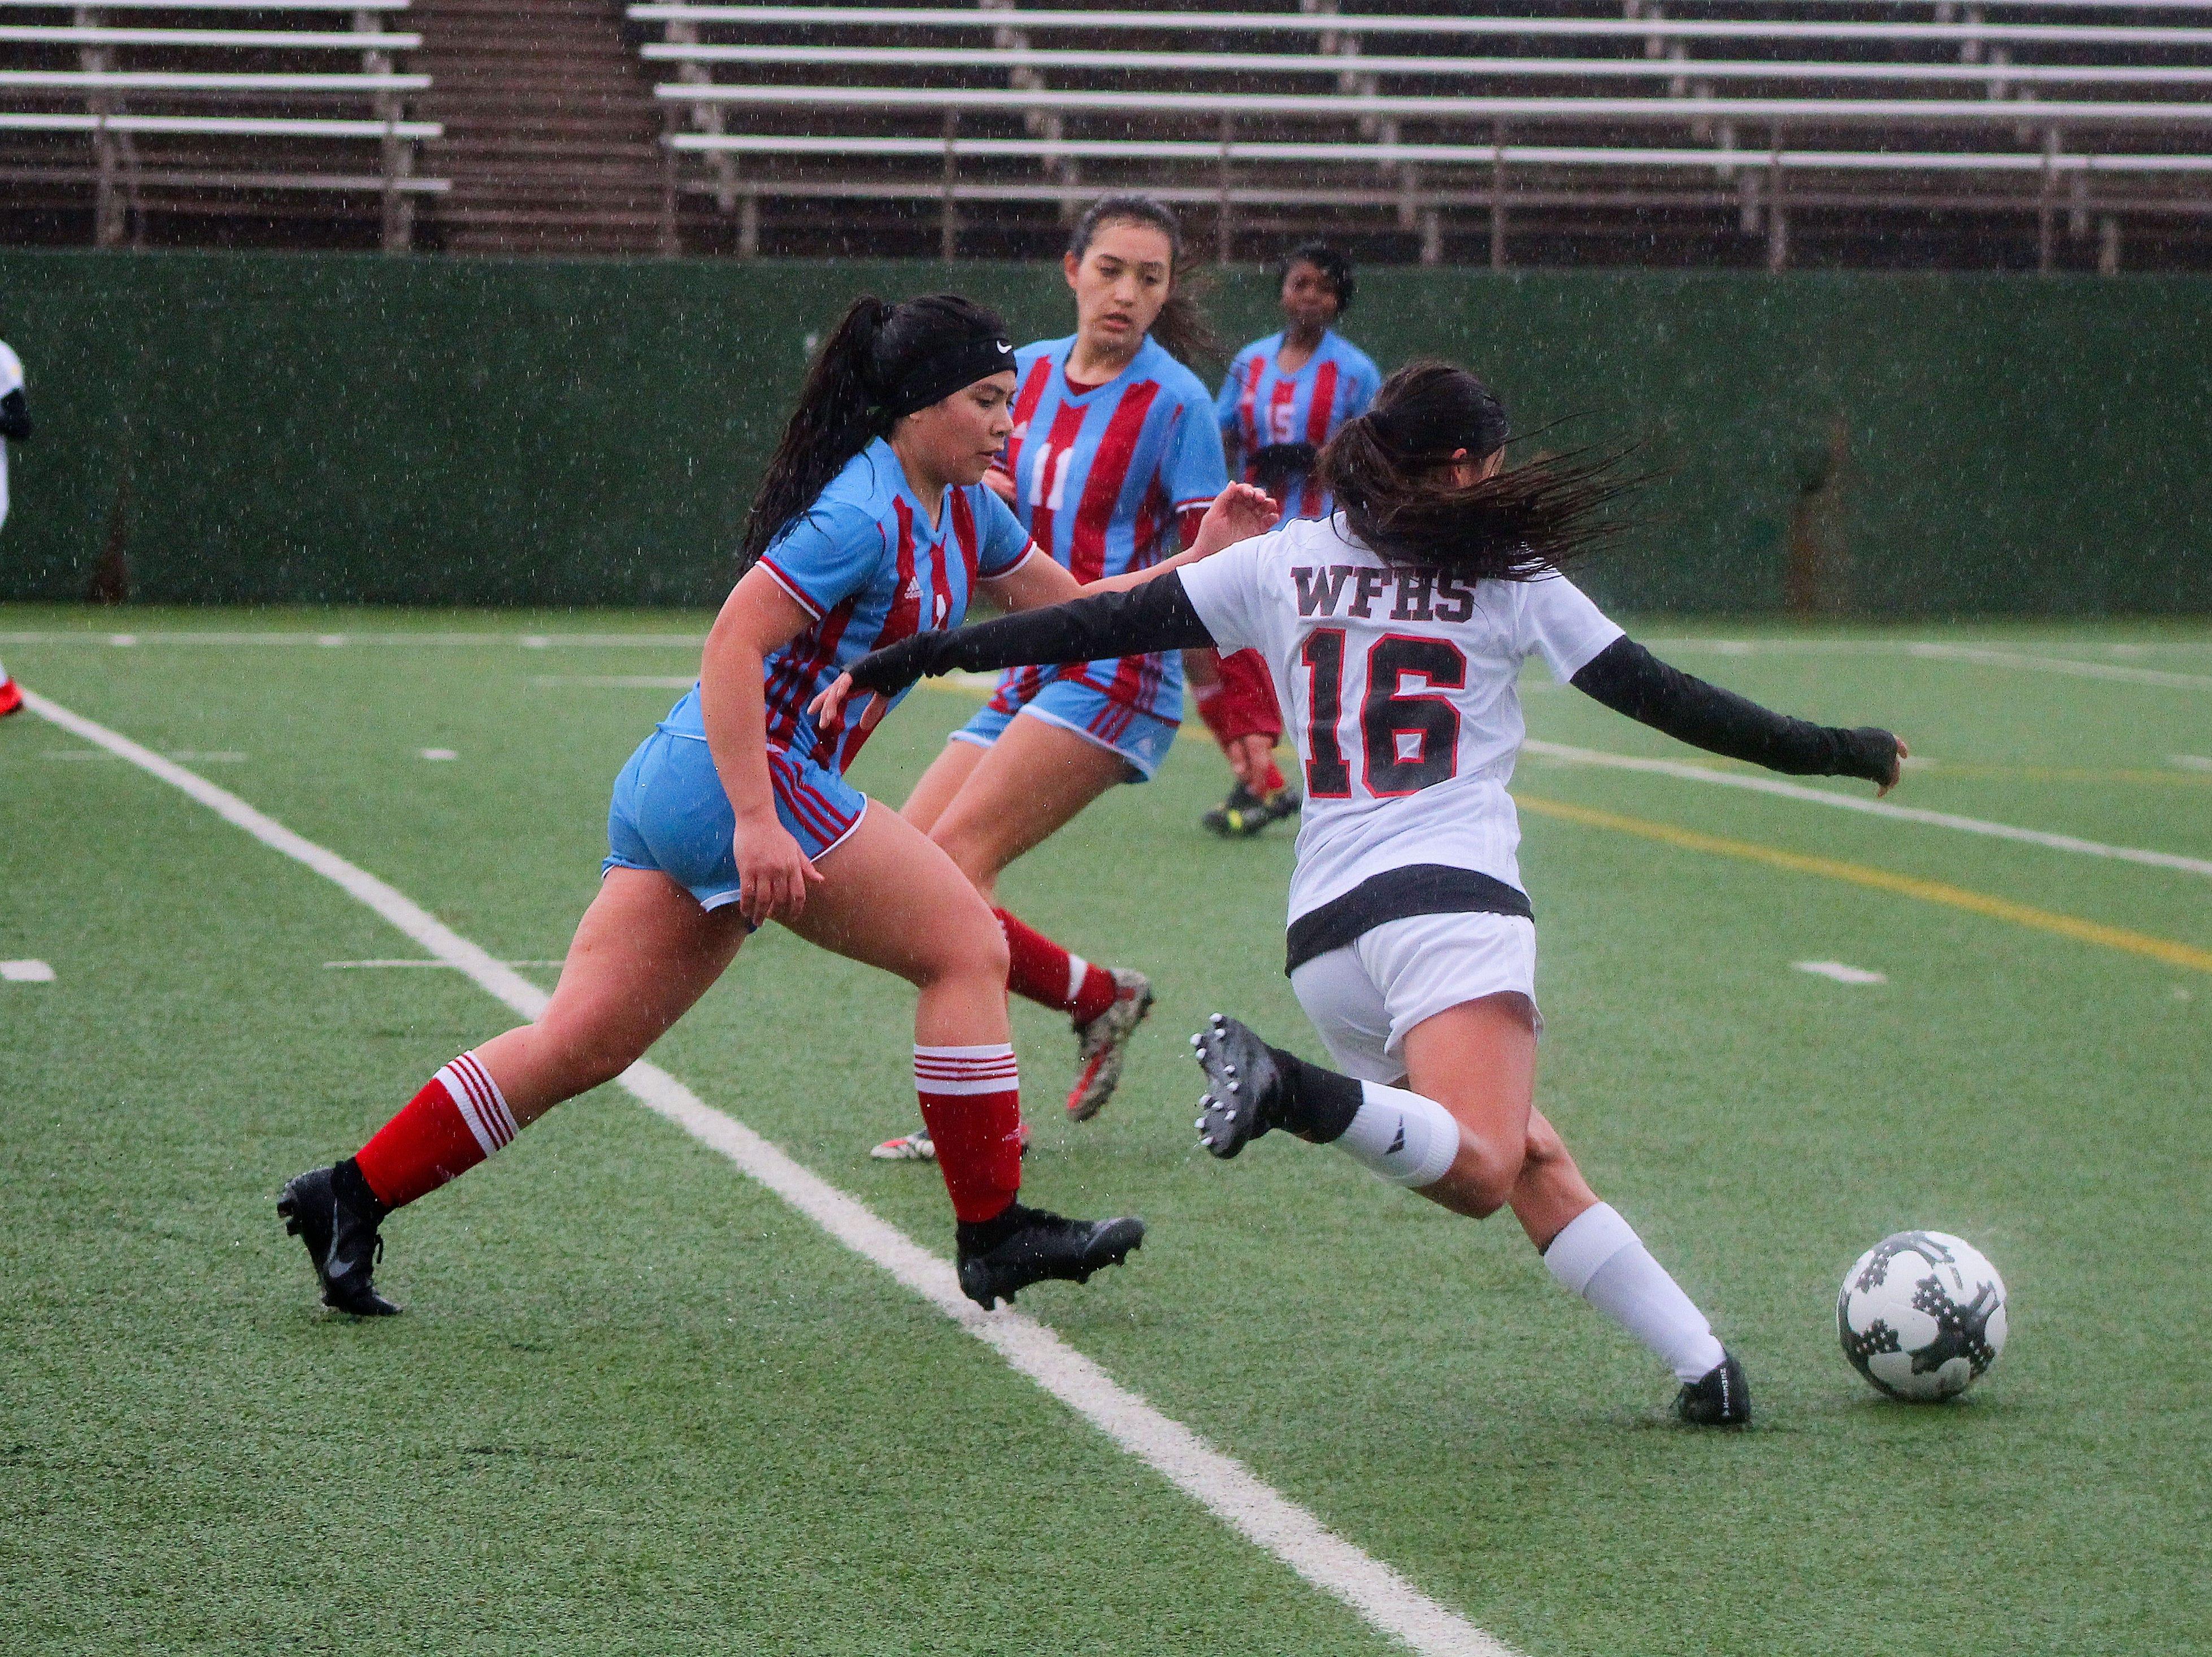 Freshman Jazel Sanchez strikes the ball for Old High as Hirschi's Ana De La Paz defends.